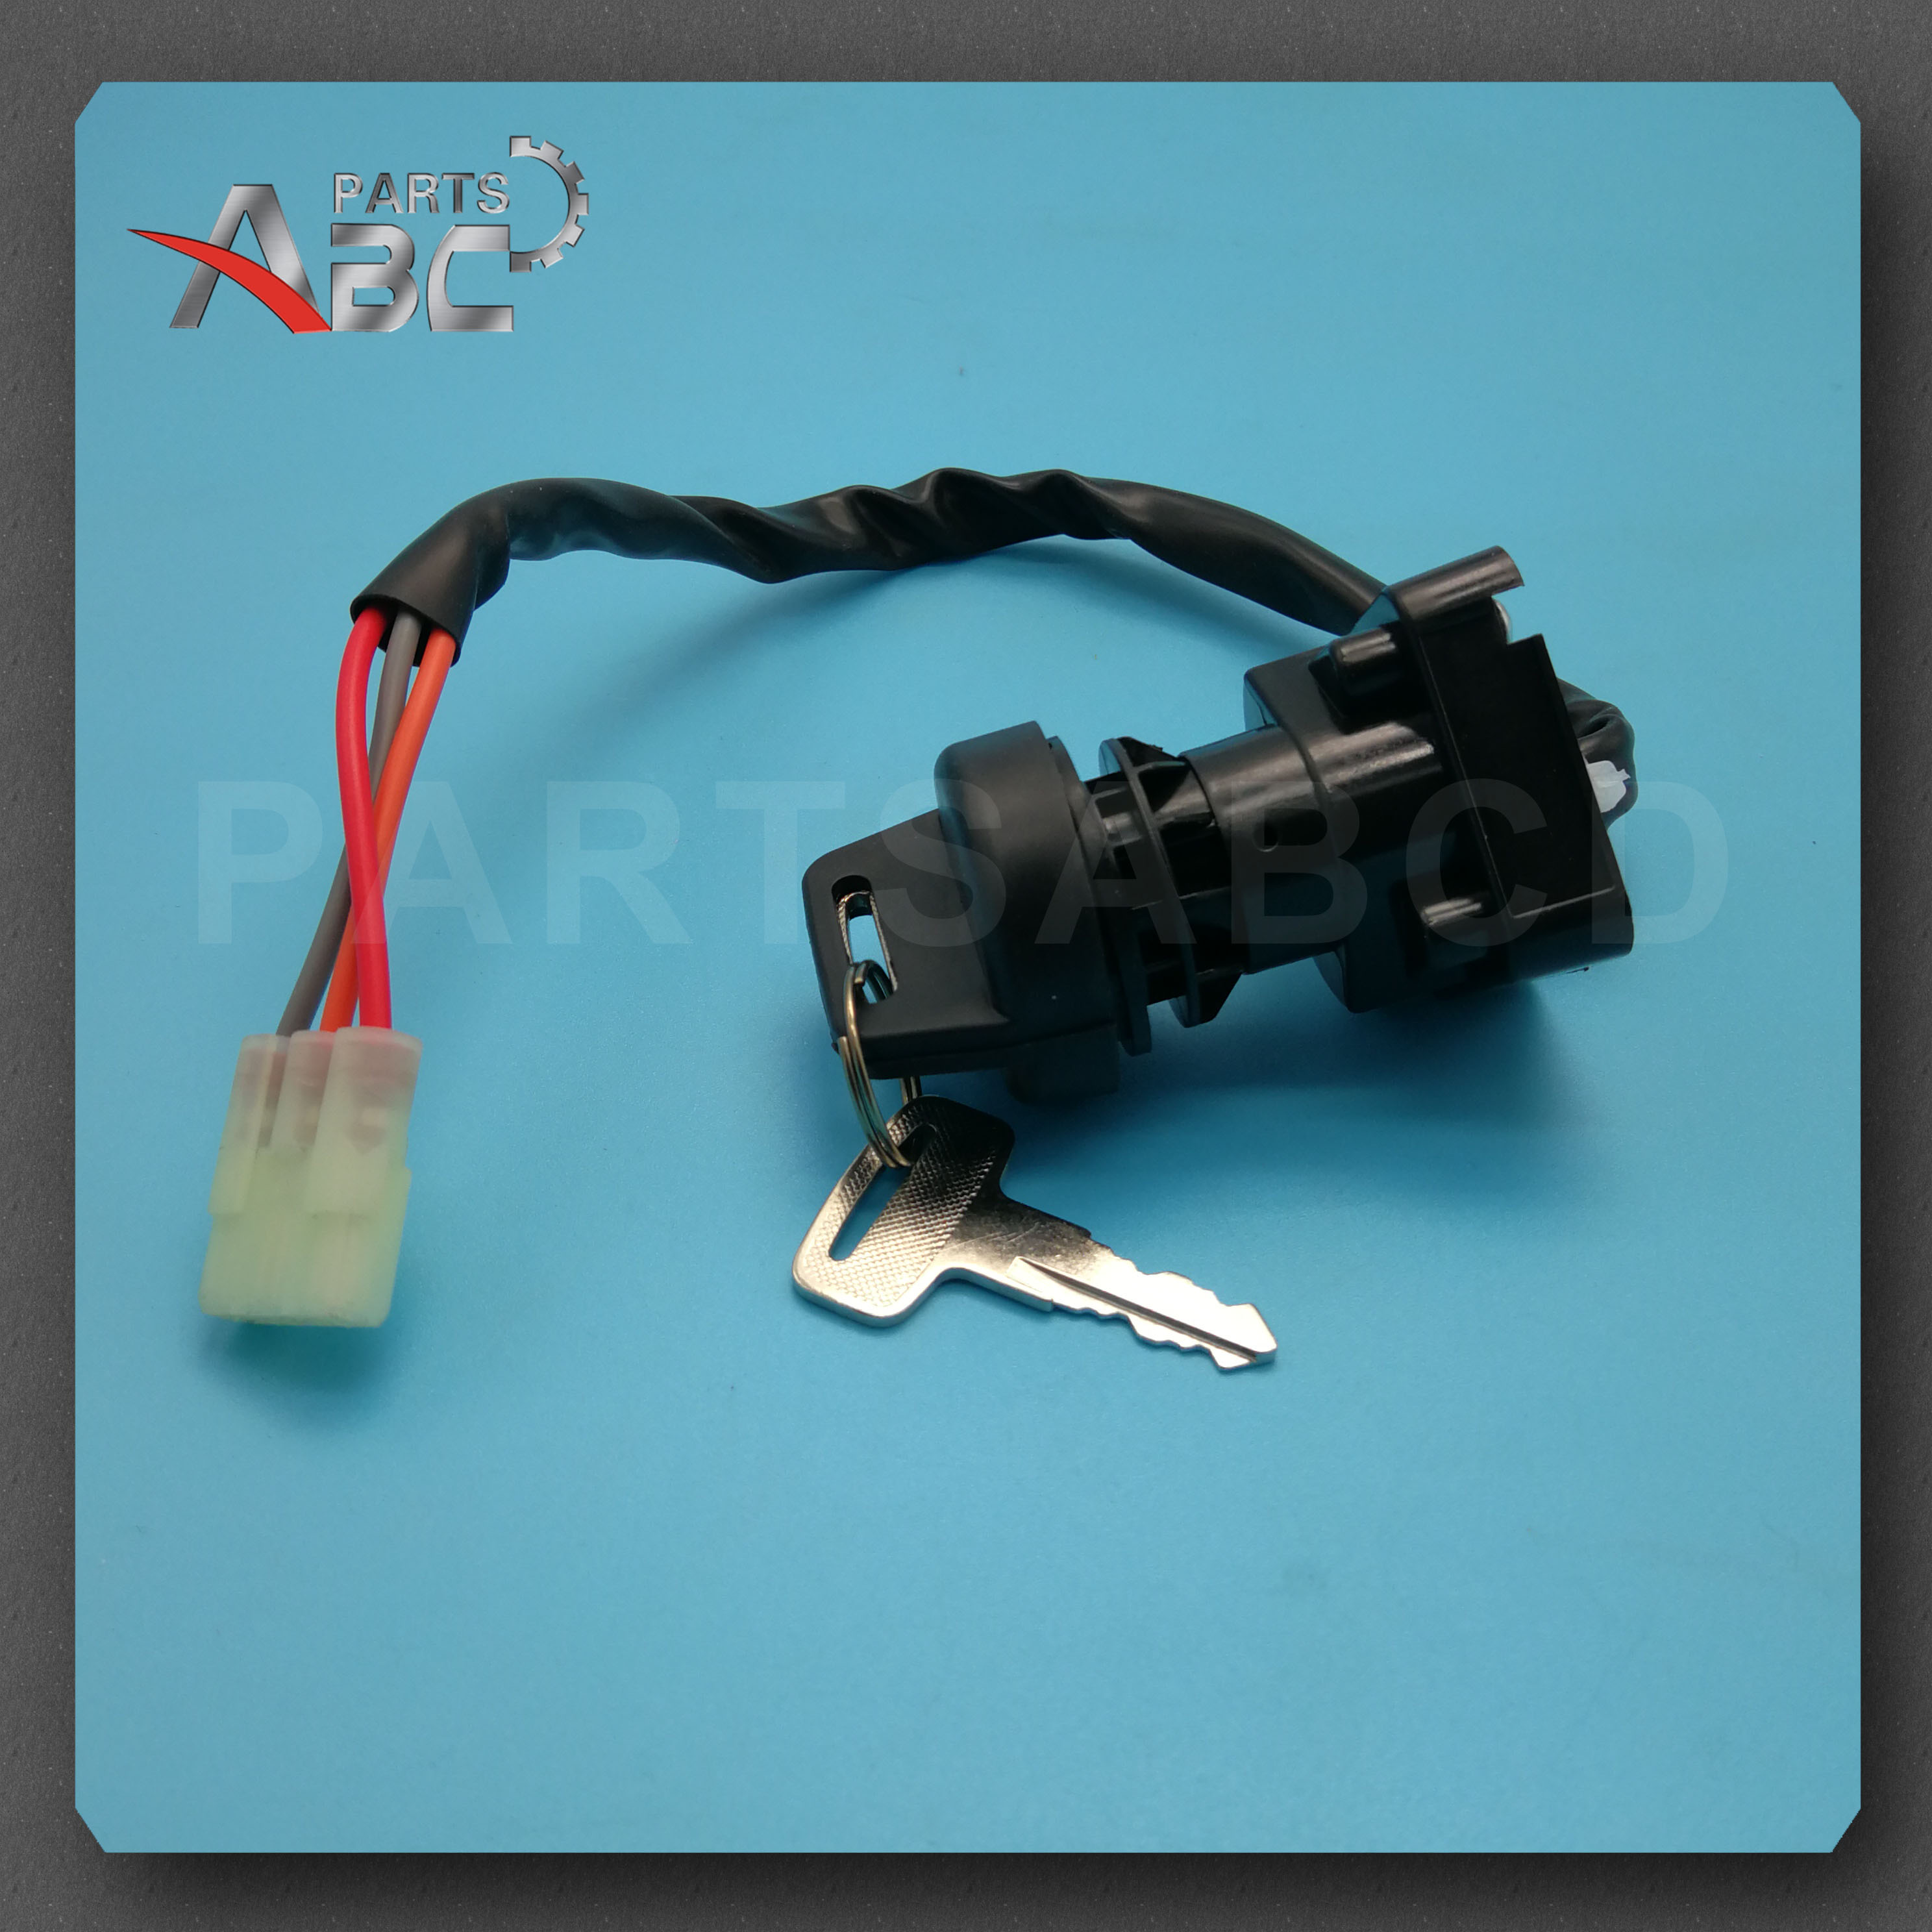 Переключатель ключа зажигания для Kawasaki KFX400 LTZ KFX 400 ATV Quad 2005 2006